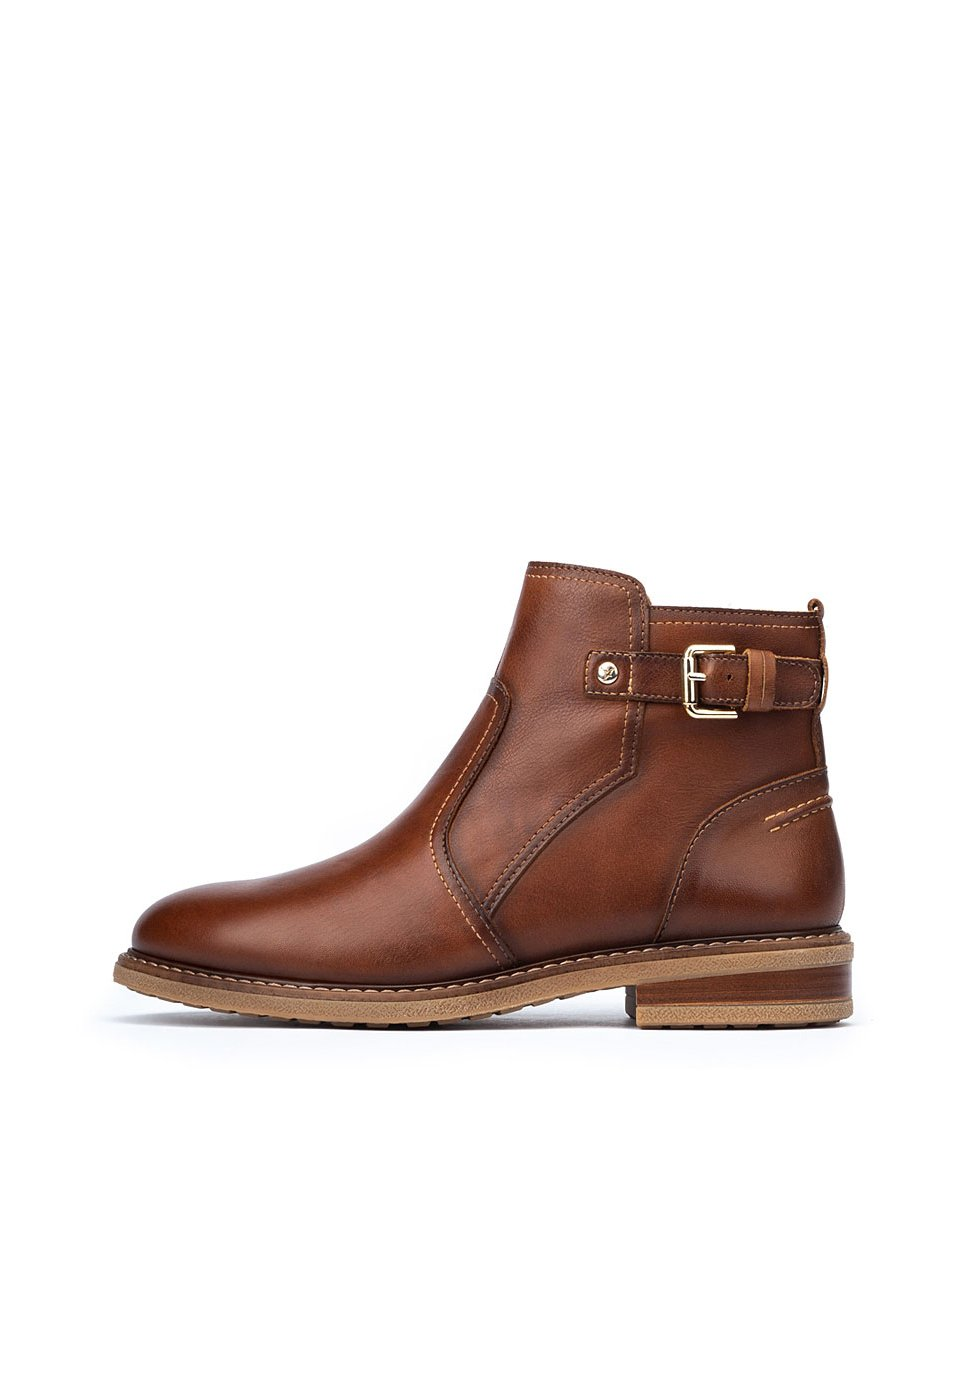 Damen PIKOLINOS  - Ankle Boot